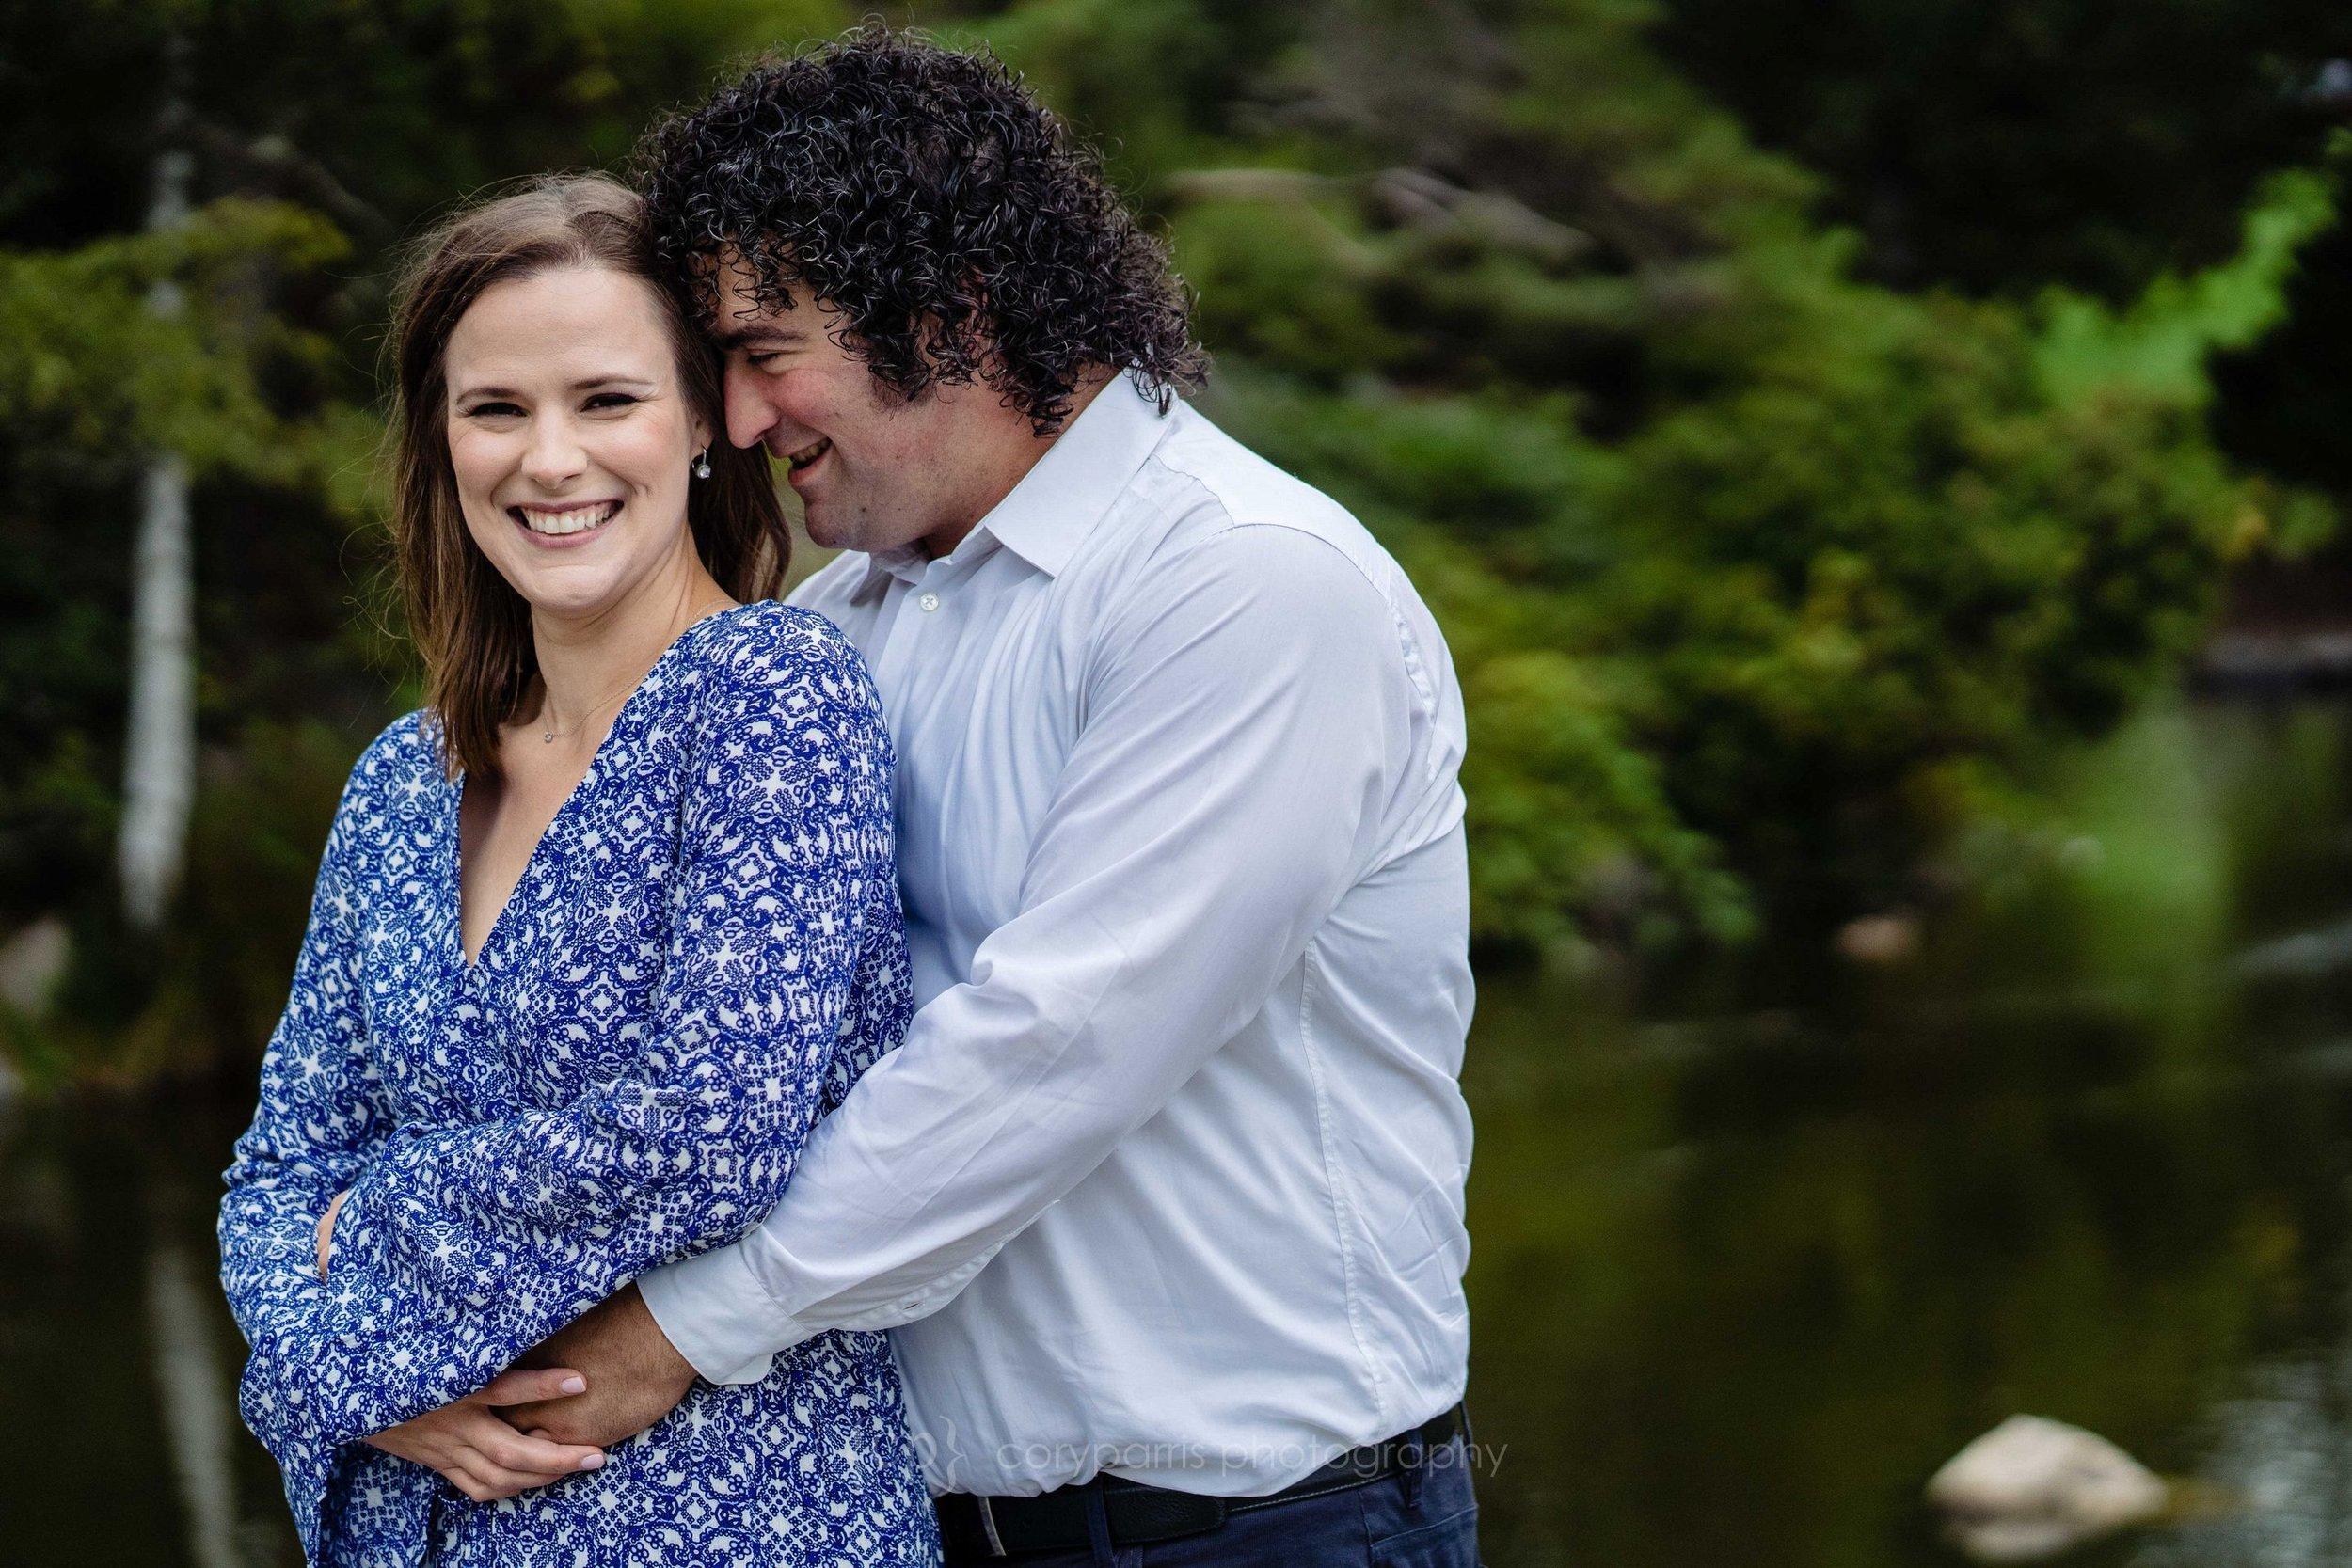 086-Tacoma-Engagement-Portraits.jpg